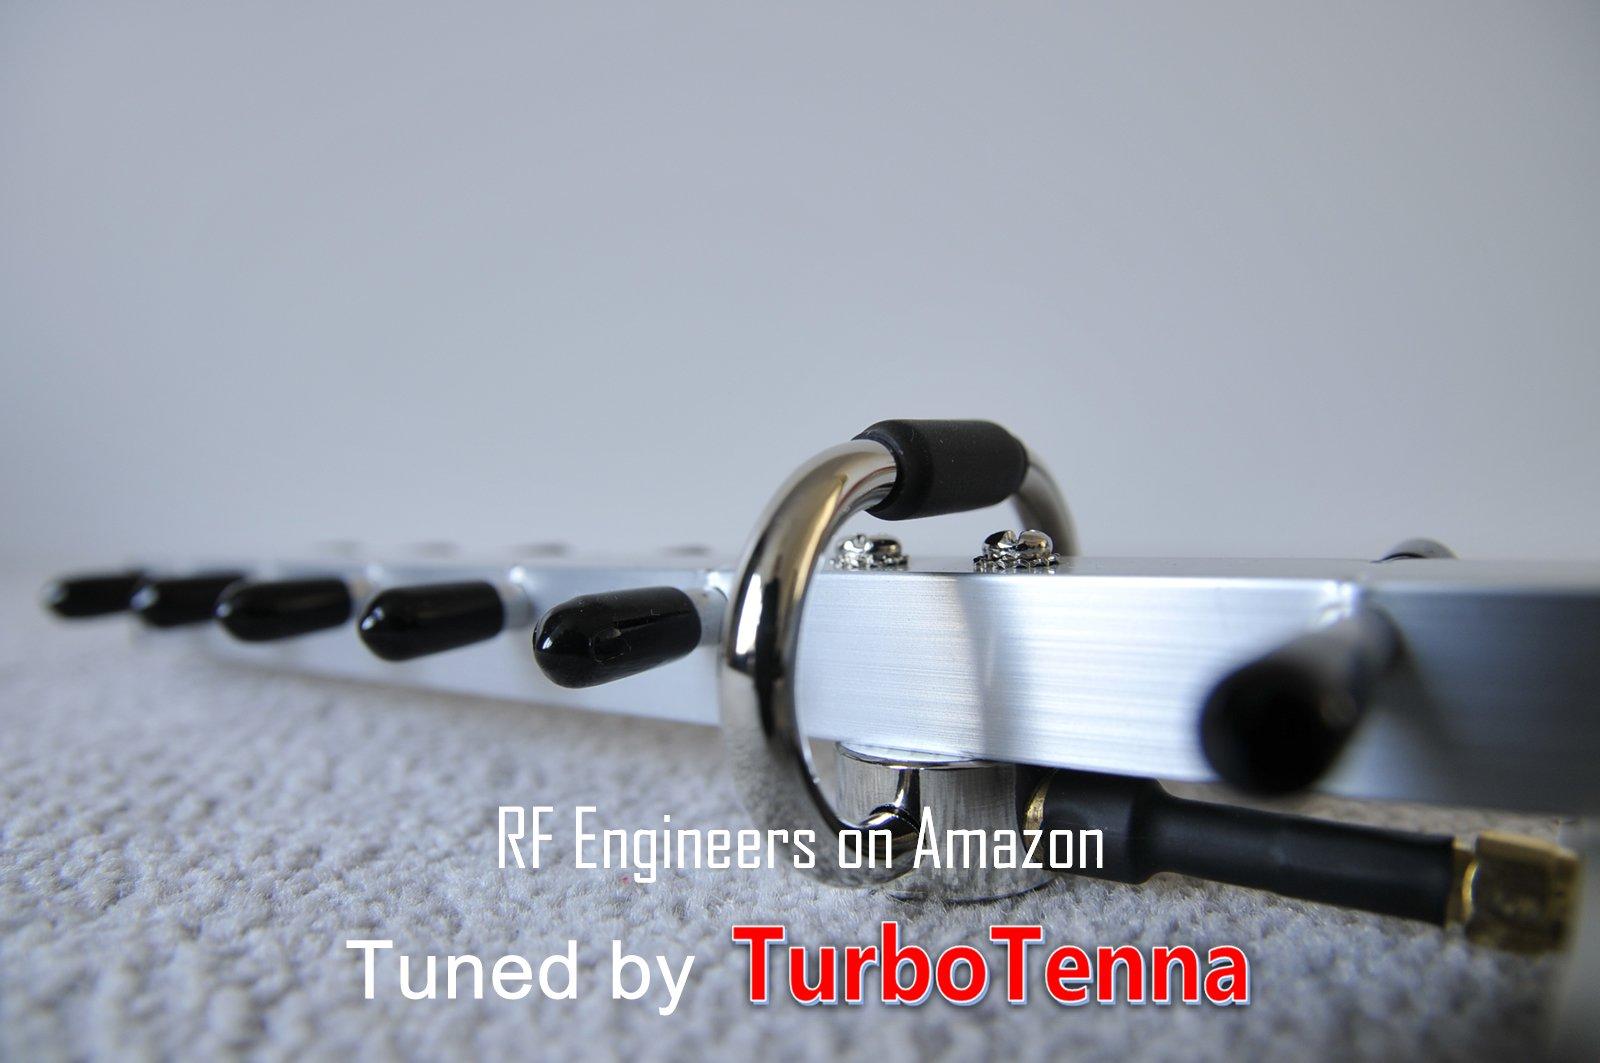 NextG USB-Yagi Plug & Play 11N Long Range WiFi antenna 2200mW by Turbotenna (Image #7)